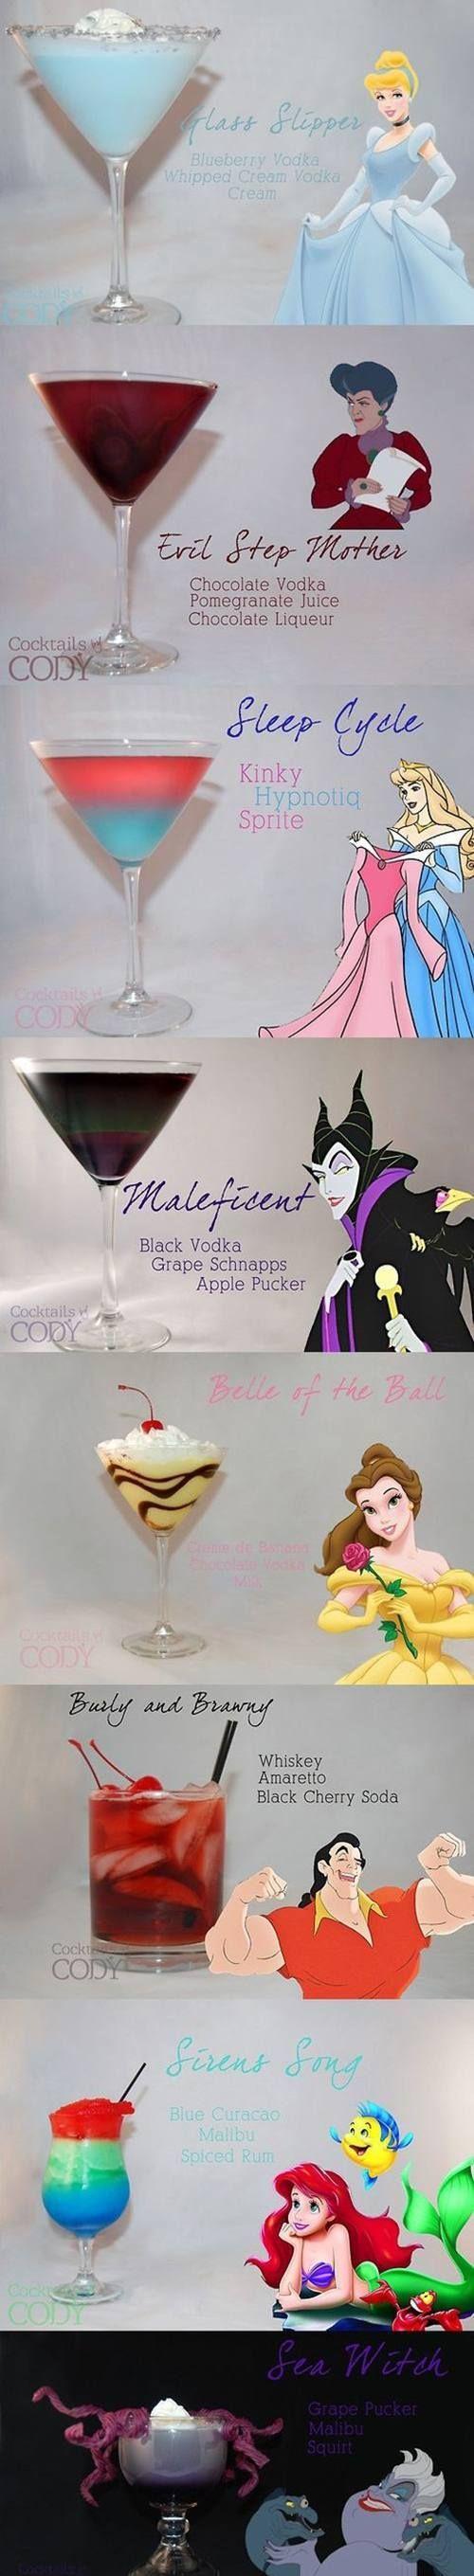 Disney princess and Disney villain inspired drinks - pure. brilliance.